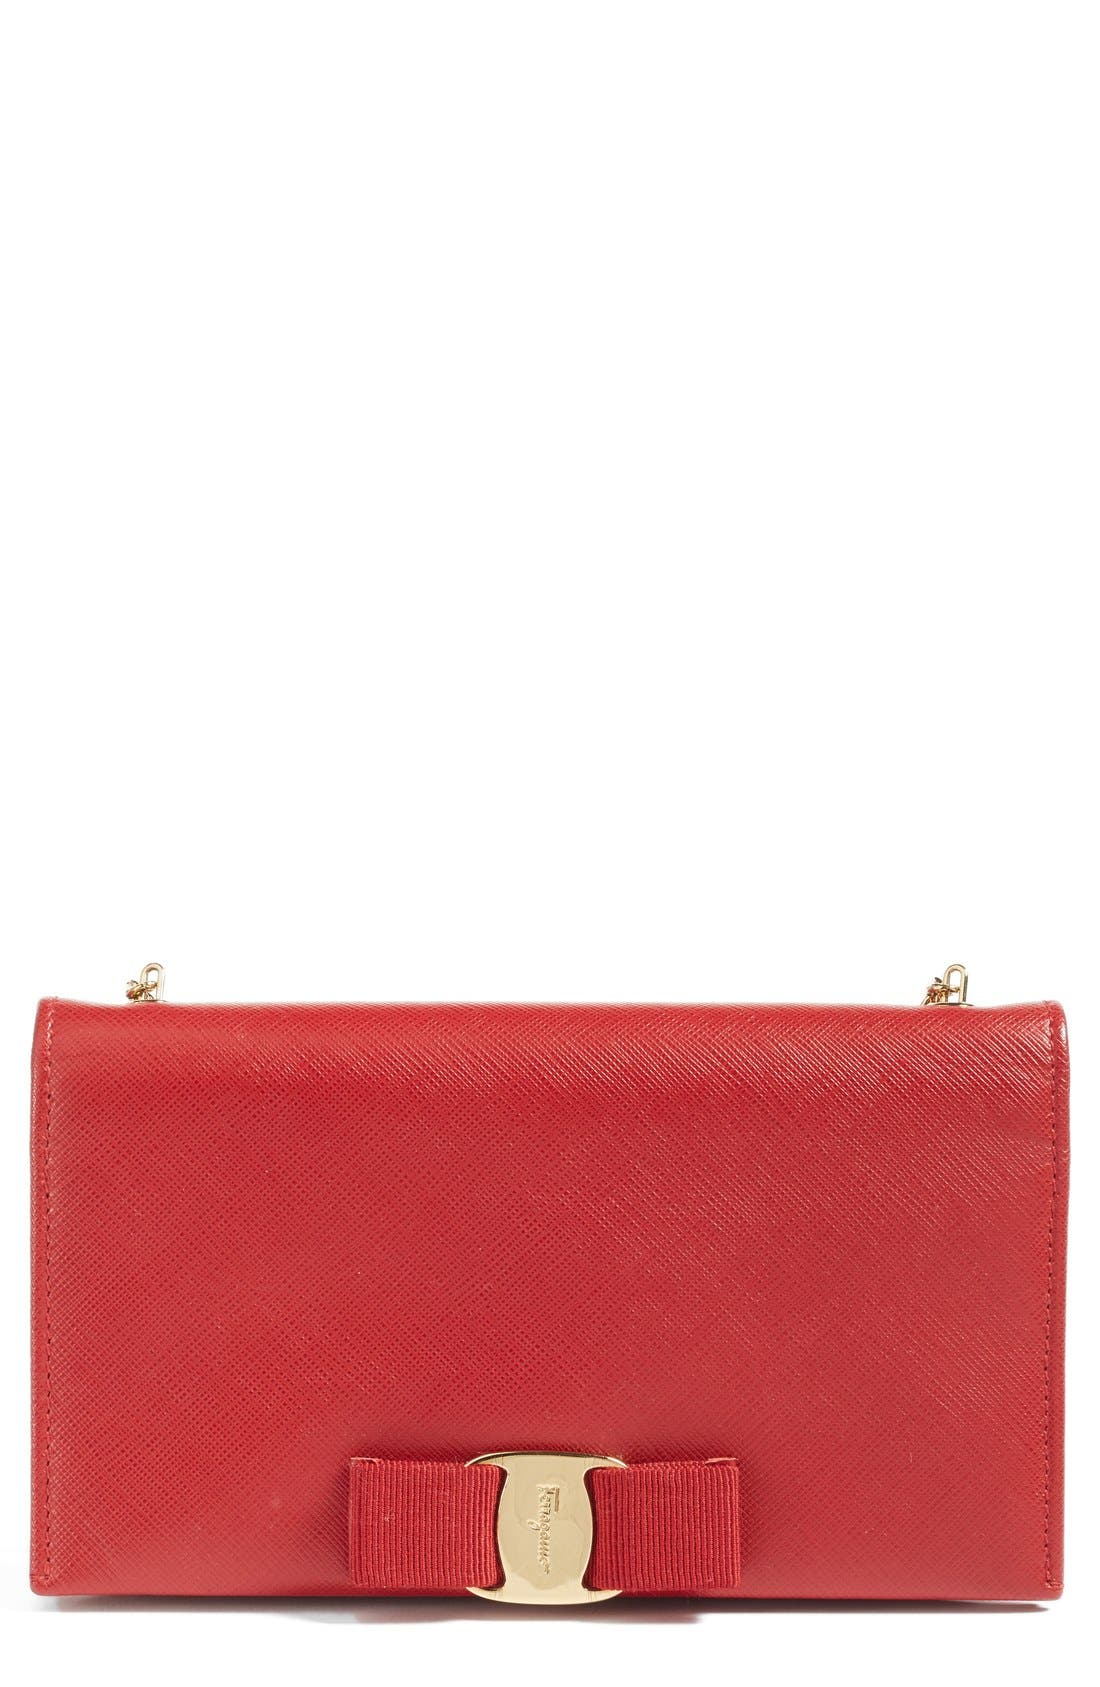 Alternate Image 1 Selected - Salavatore Ferragamo Vara Leather Wallet on a Chain